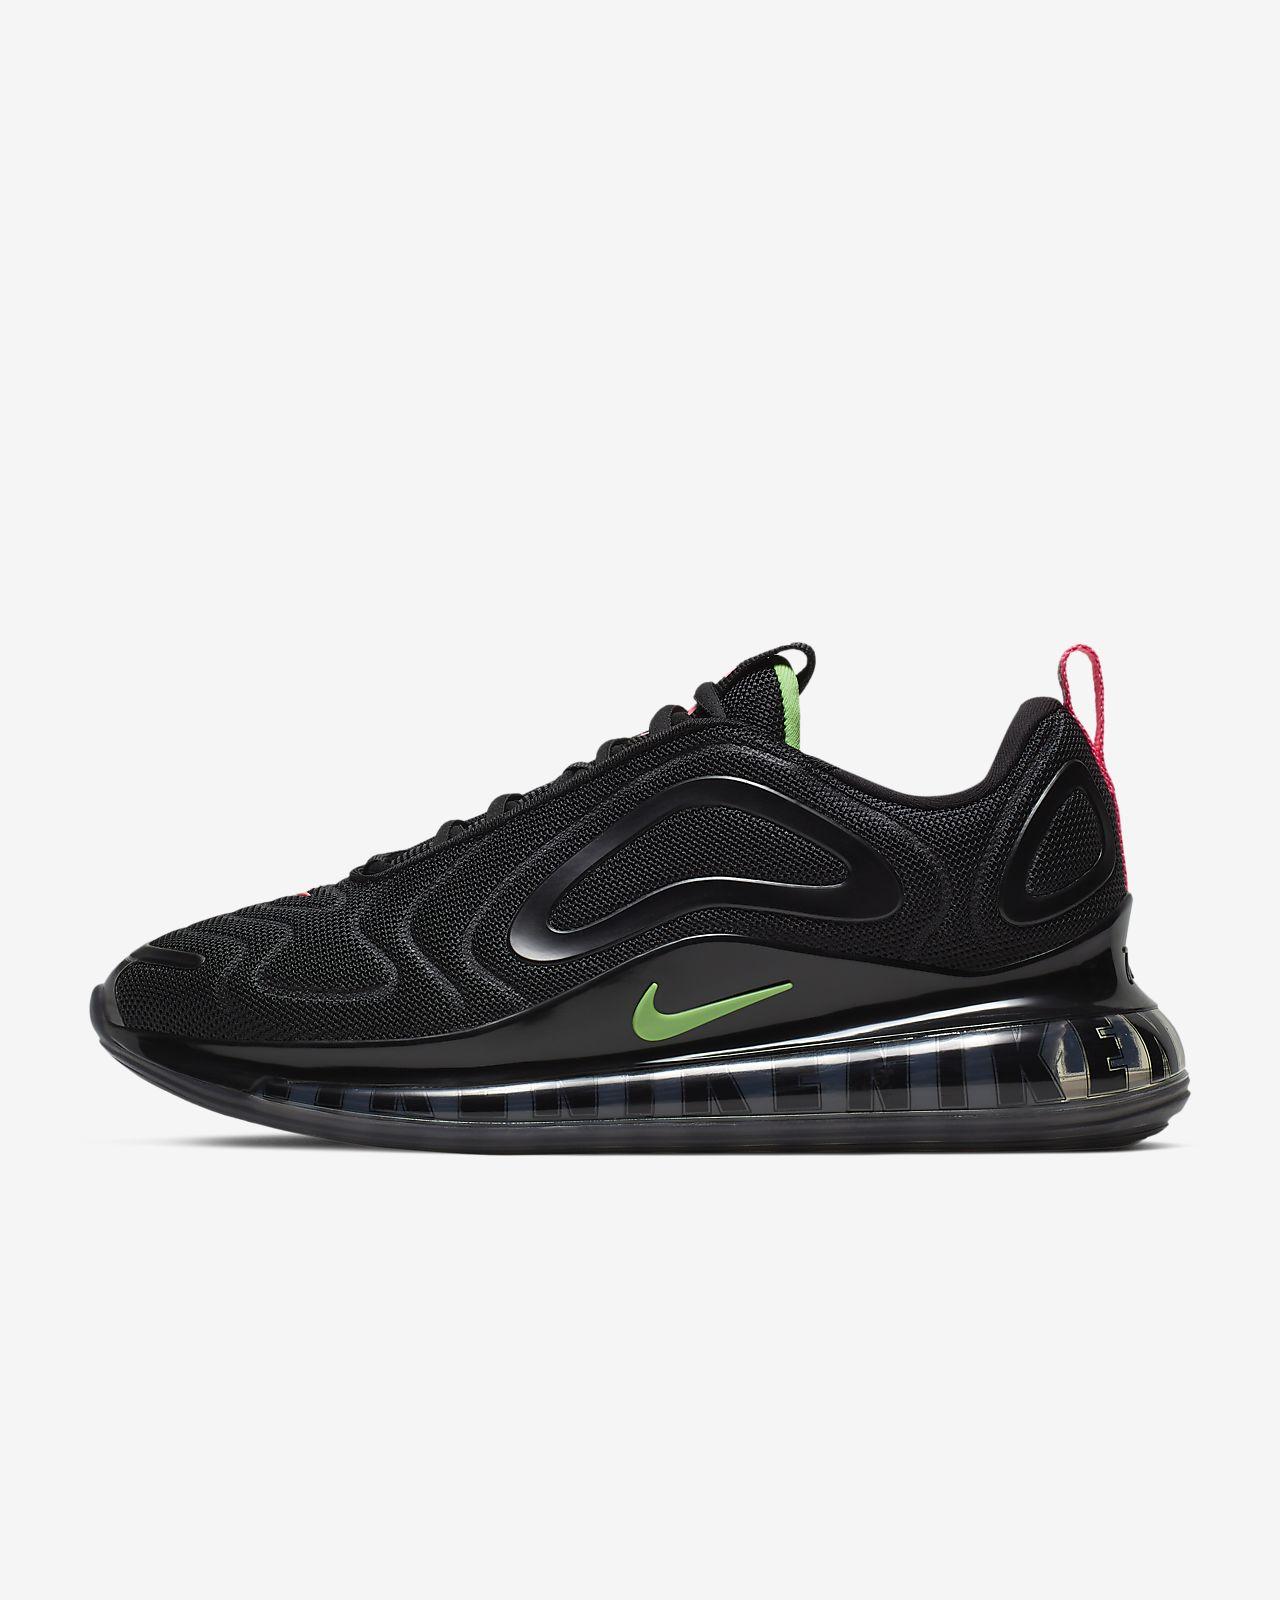 Nike Air Max 720 Zapatillas - Hombre